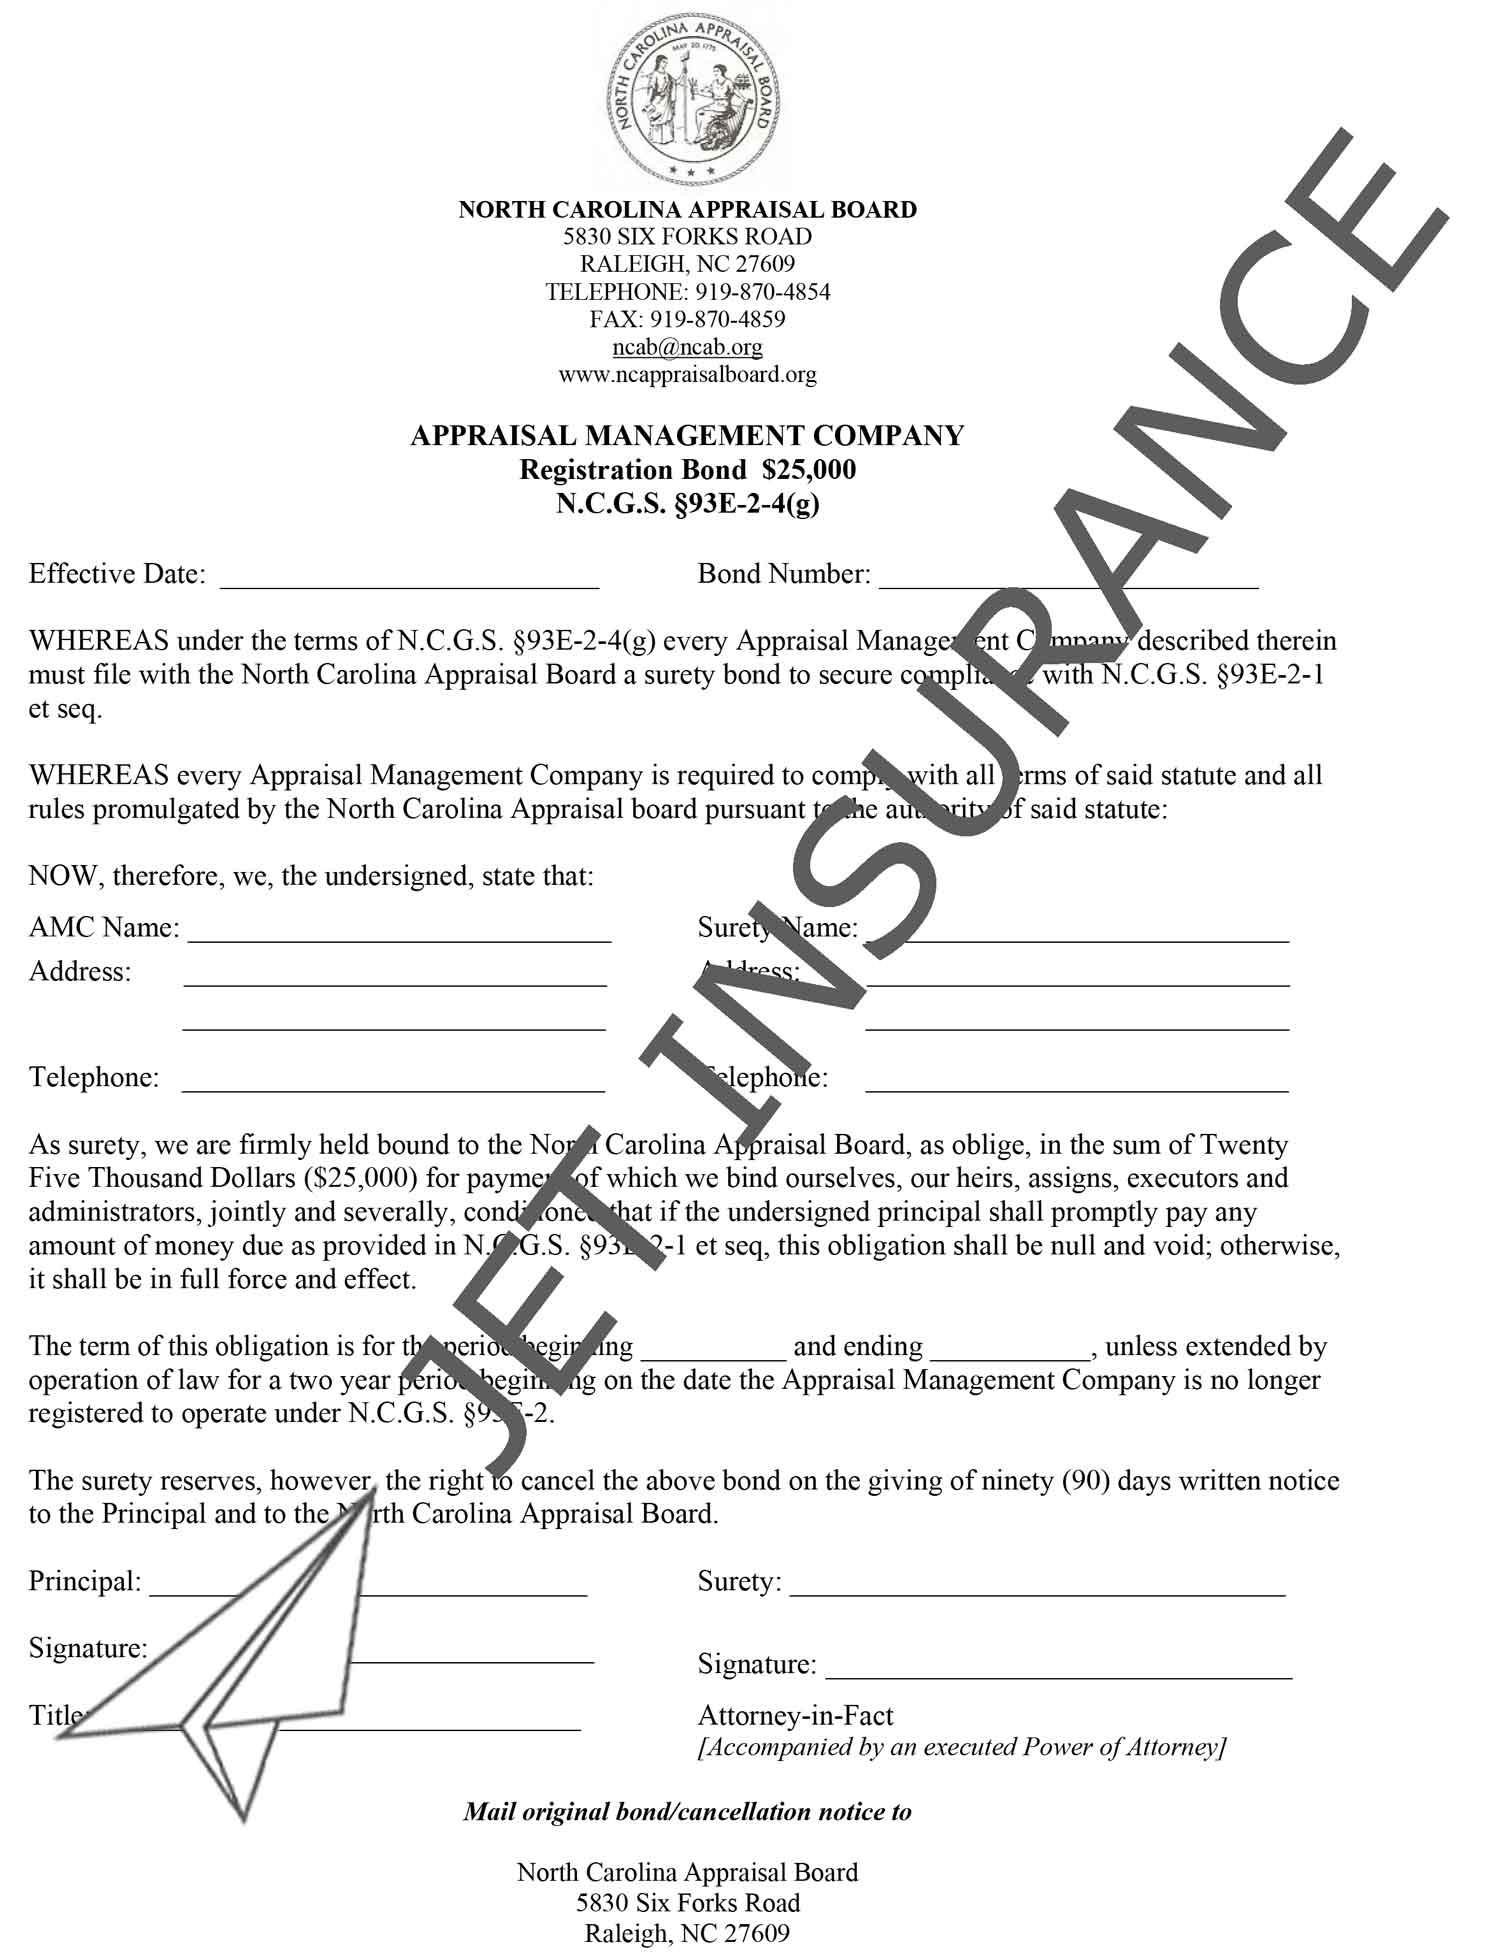 North Carolina Appraisal Management Company Bond Form